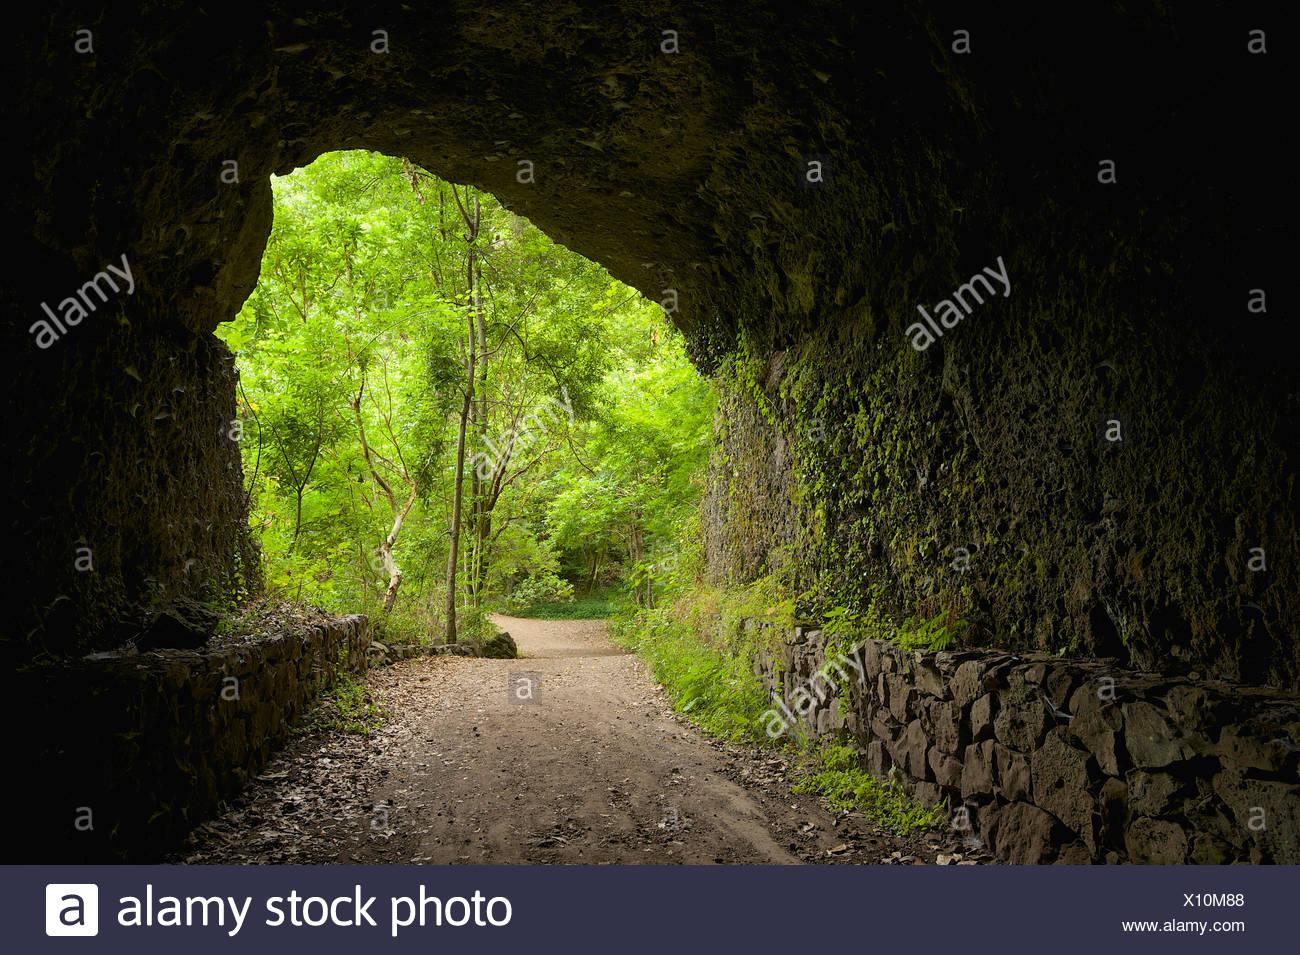 Kanaren, Kanarische Inseln, Inseln, La Palma, Spanien, Europa, draußen, Tag, niemand, Los Tilos, Weg, Weg, Weg, Höhle Stockbild